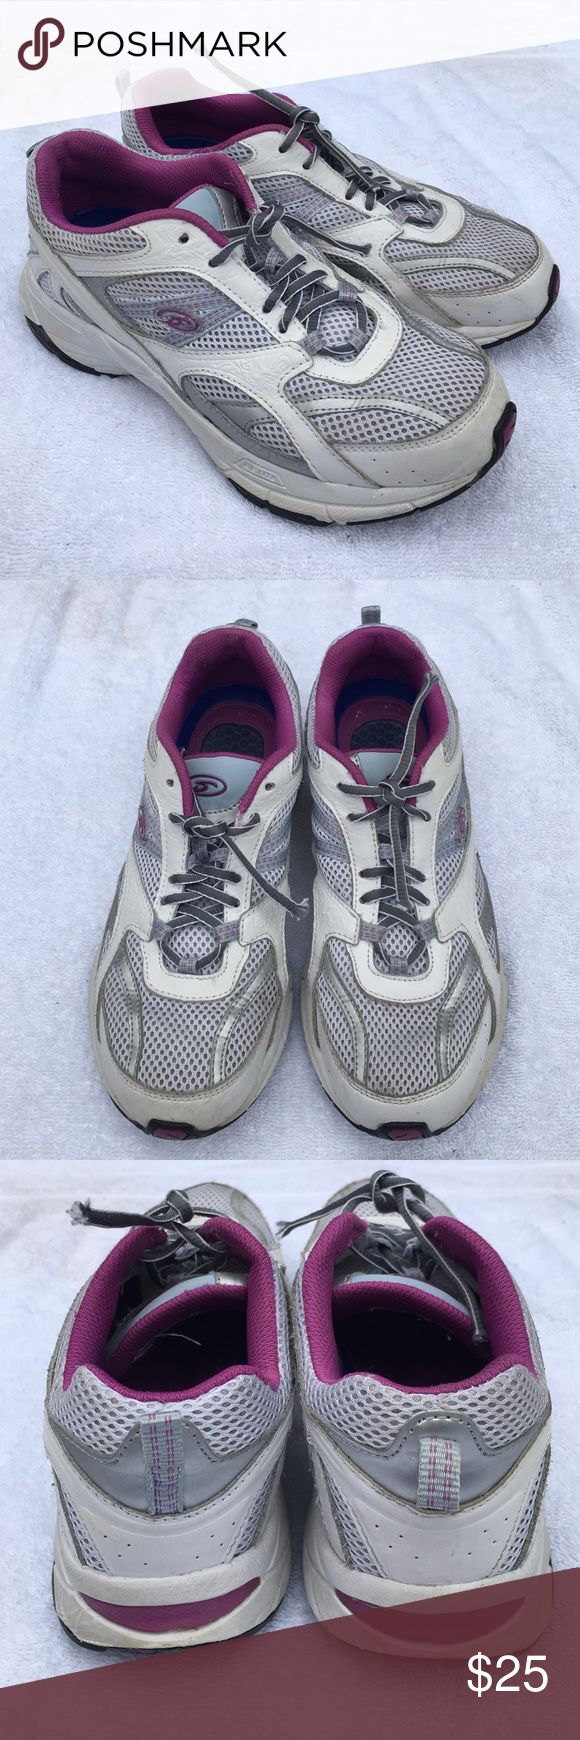 Dr. Scholl's Gym Shoes Dr. Scholl's Isabella-MT,Advanced Comfort Series, Needs New Laces, Purple/ Silver/ White, Size 8, No Box Dr. Scholl's Shoes Athletic Shoes